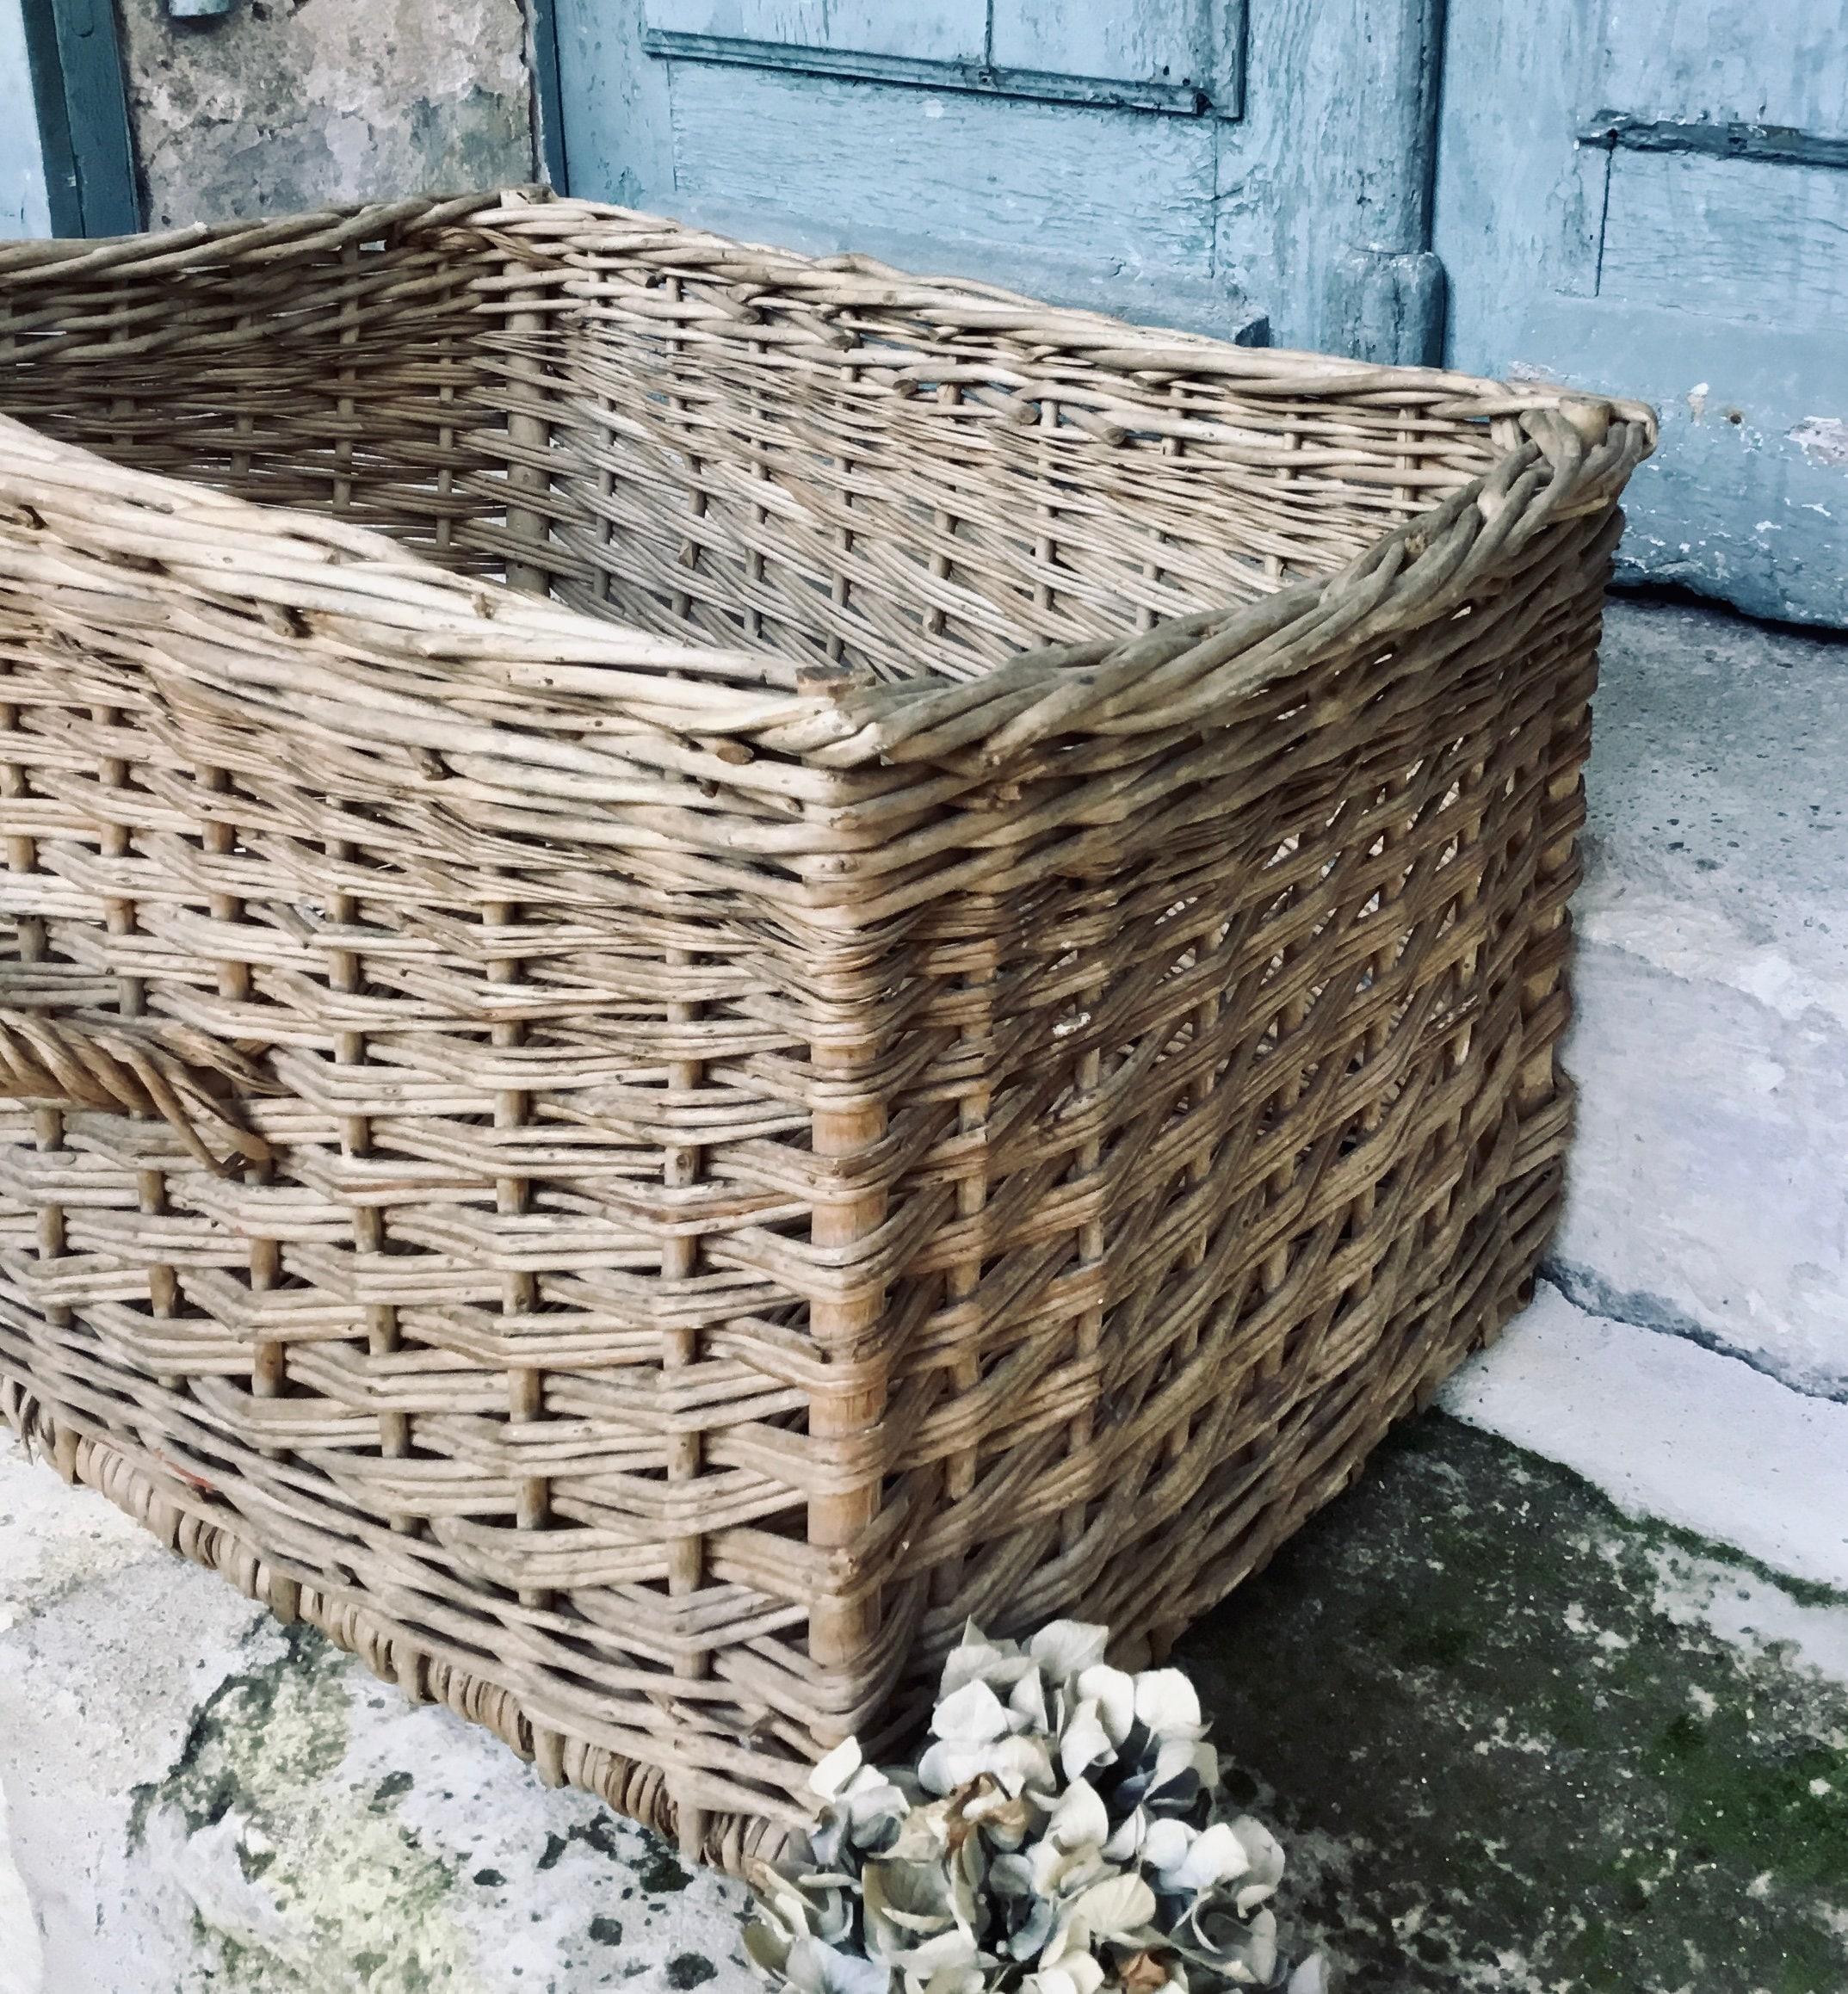 Absolutely Stunning Large Antique French Storage Basket Wicker Hamper Log Basket Shoe Storage Washing Basket Blanket Basket